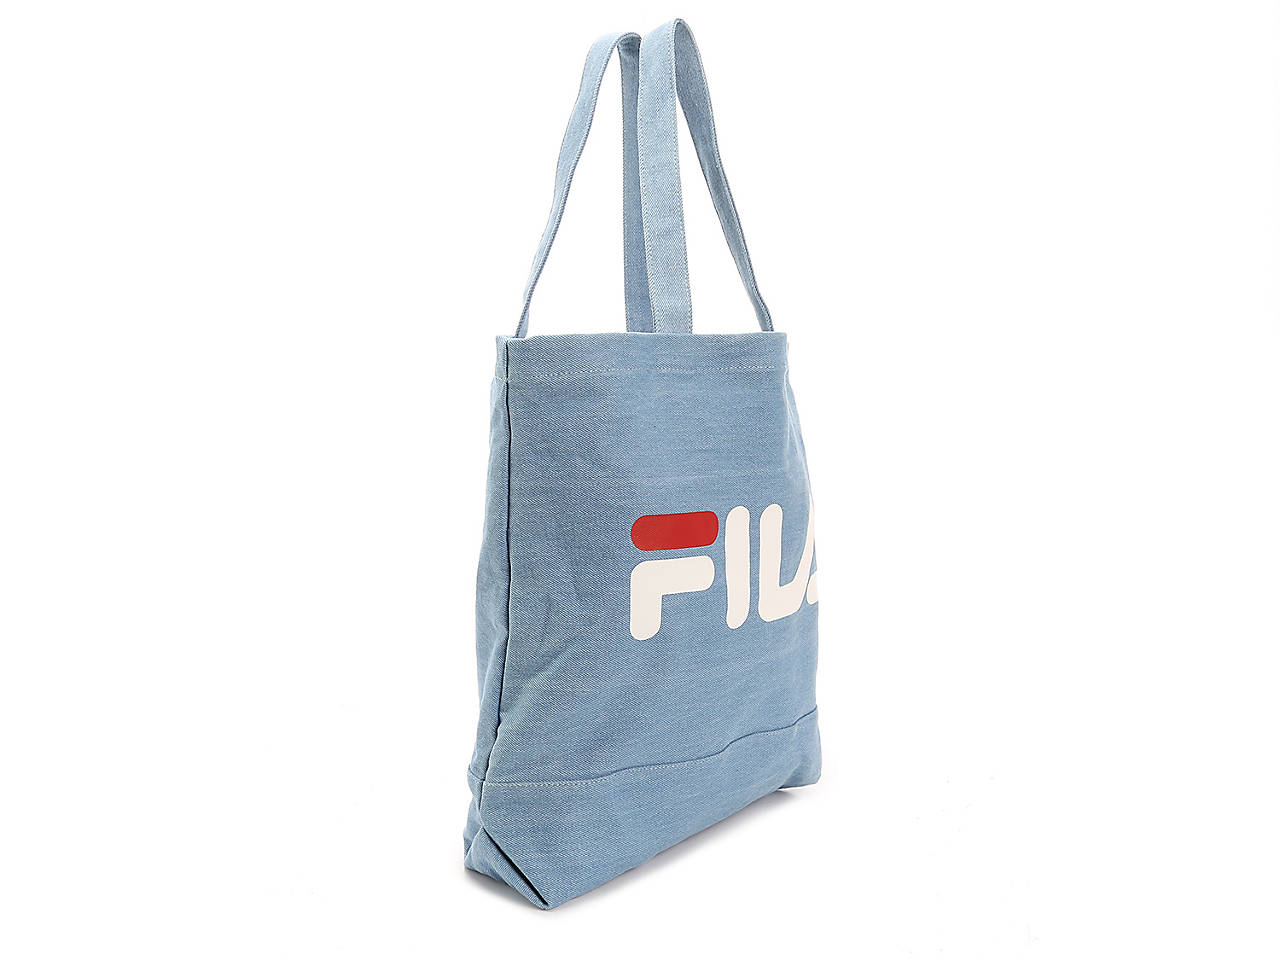 beafbd5f75 Fila Canvas Tote Women s Handbags   Accessories